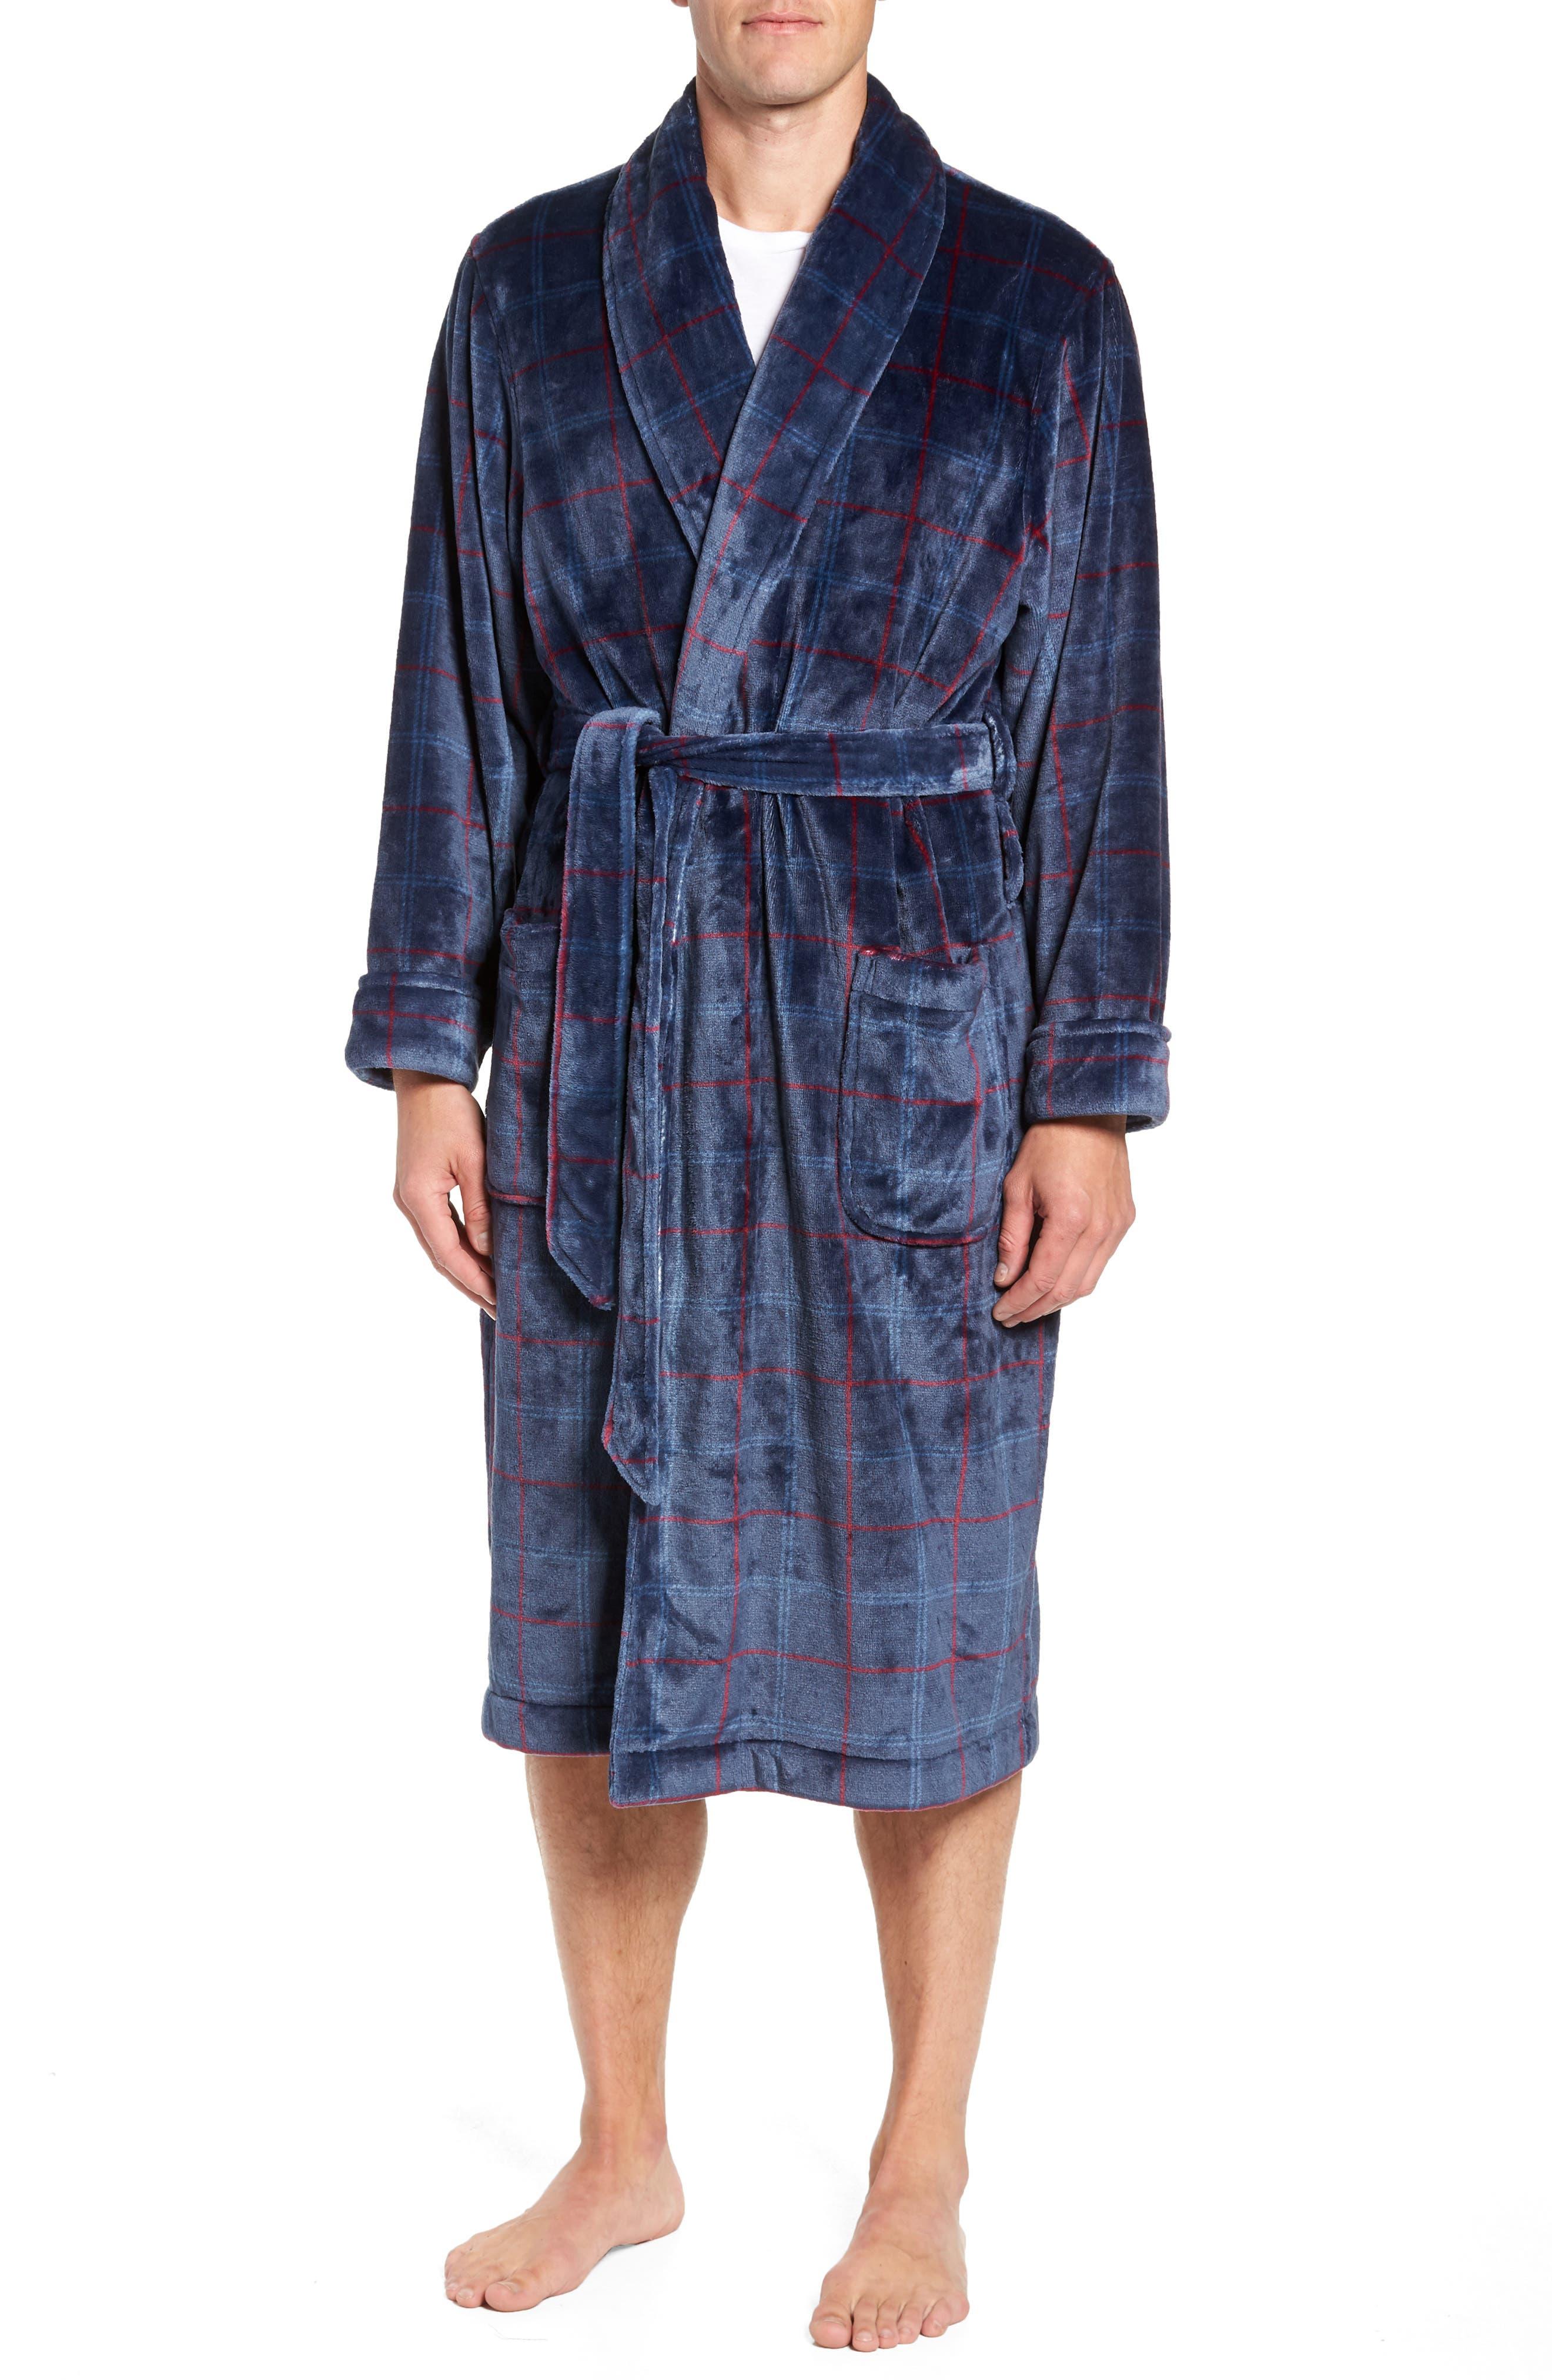 Windowpane Fleece Robe,                             Main thumbnail 1, color,                             NAVY -RED WINDOWPANE